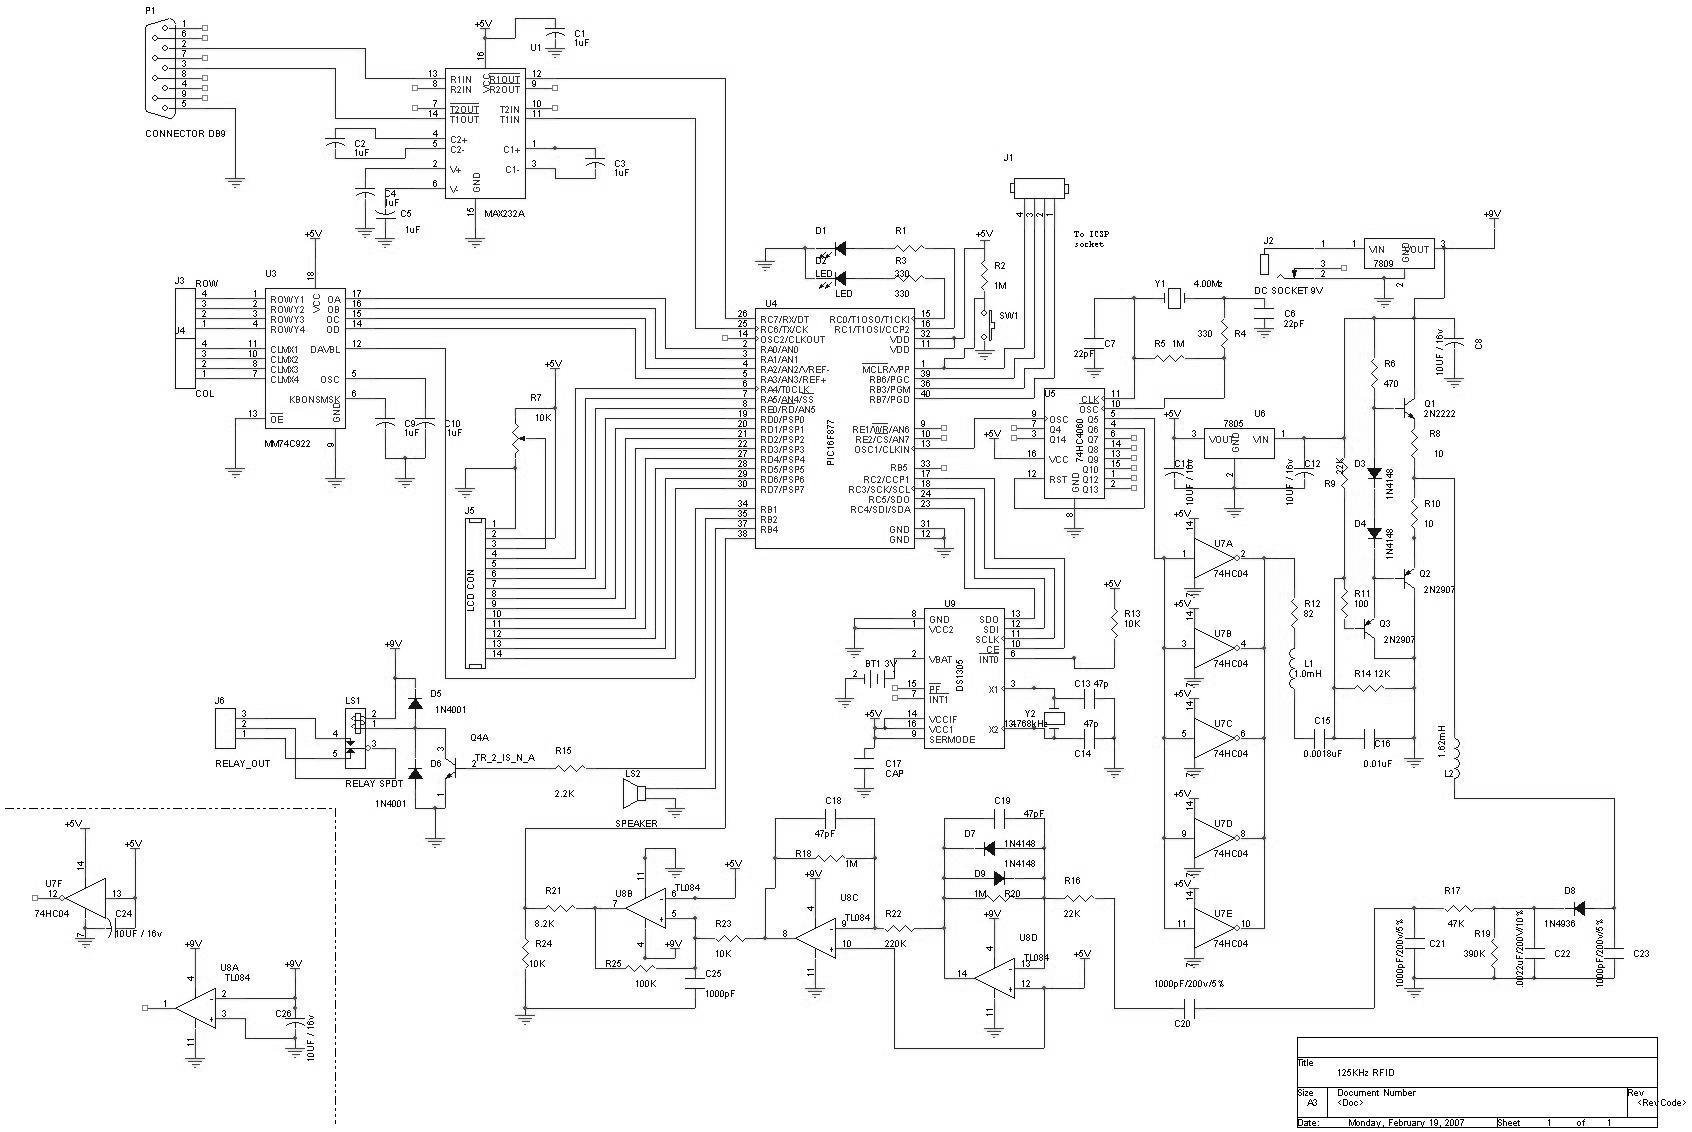 Accelerometer Wiring Diagram Volvo Penta Tach Wiring Diagram